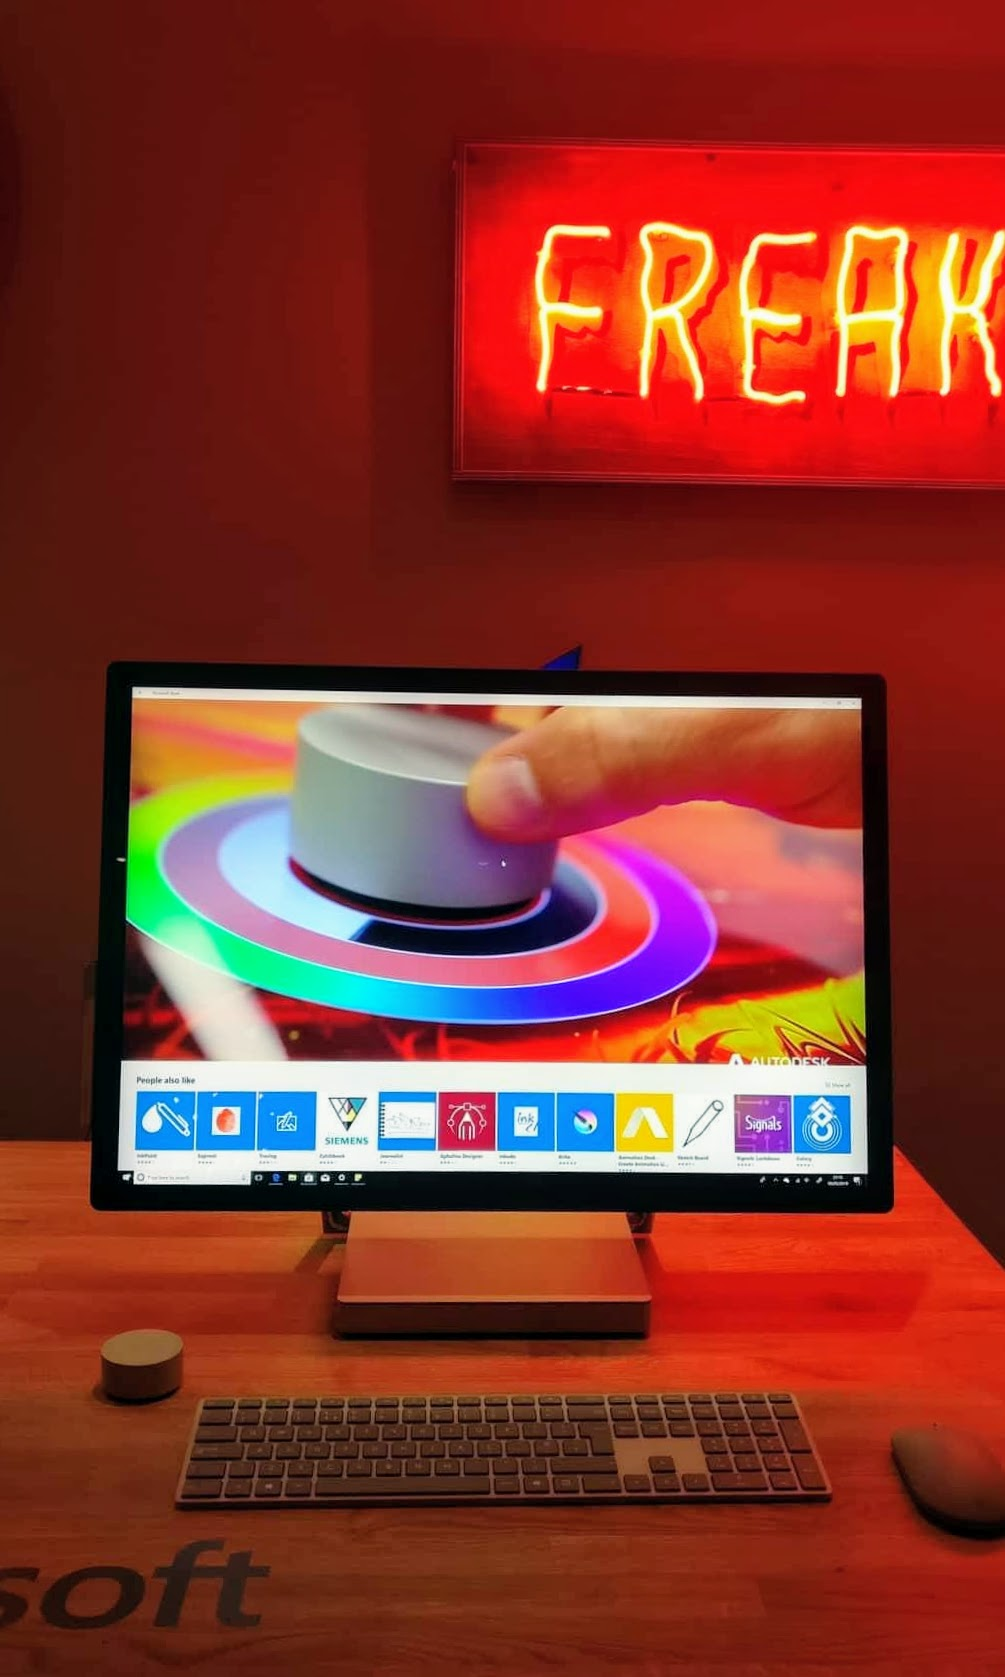 The Microsoft Surface Studio computer